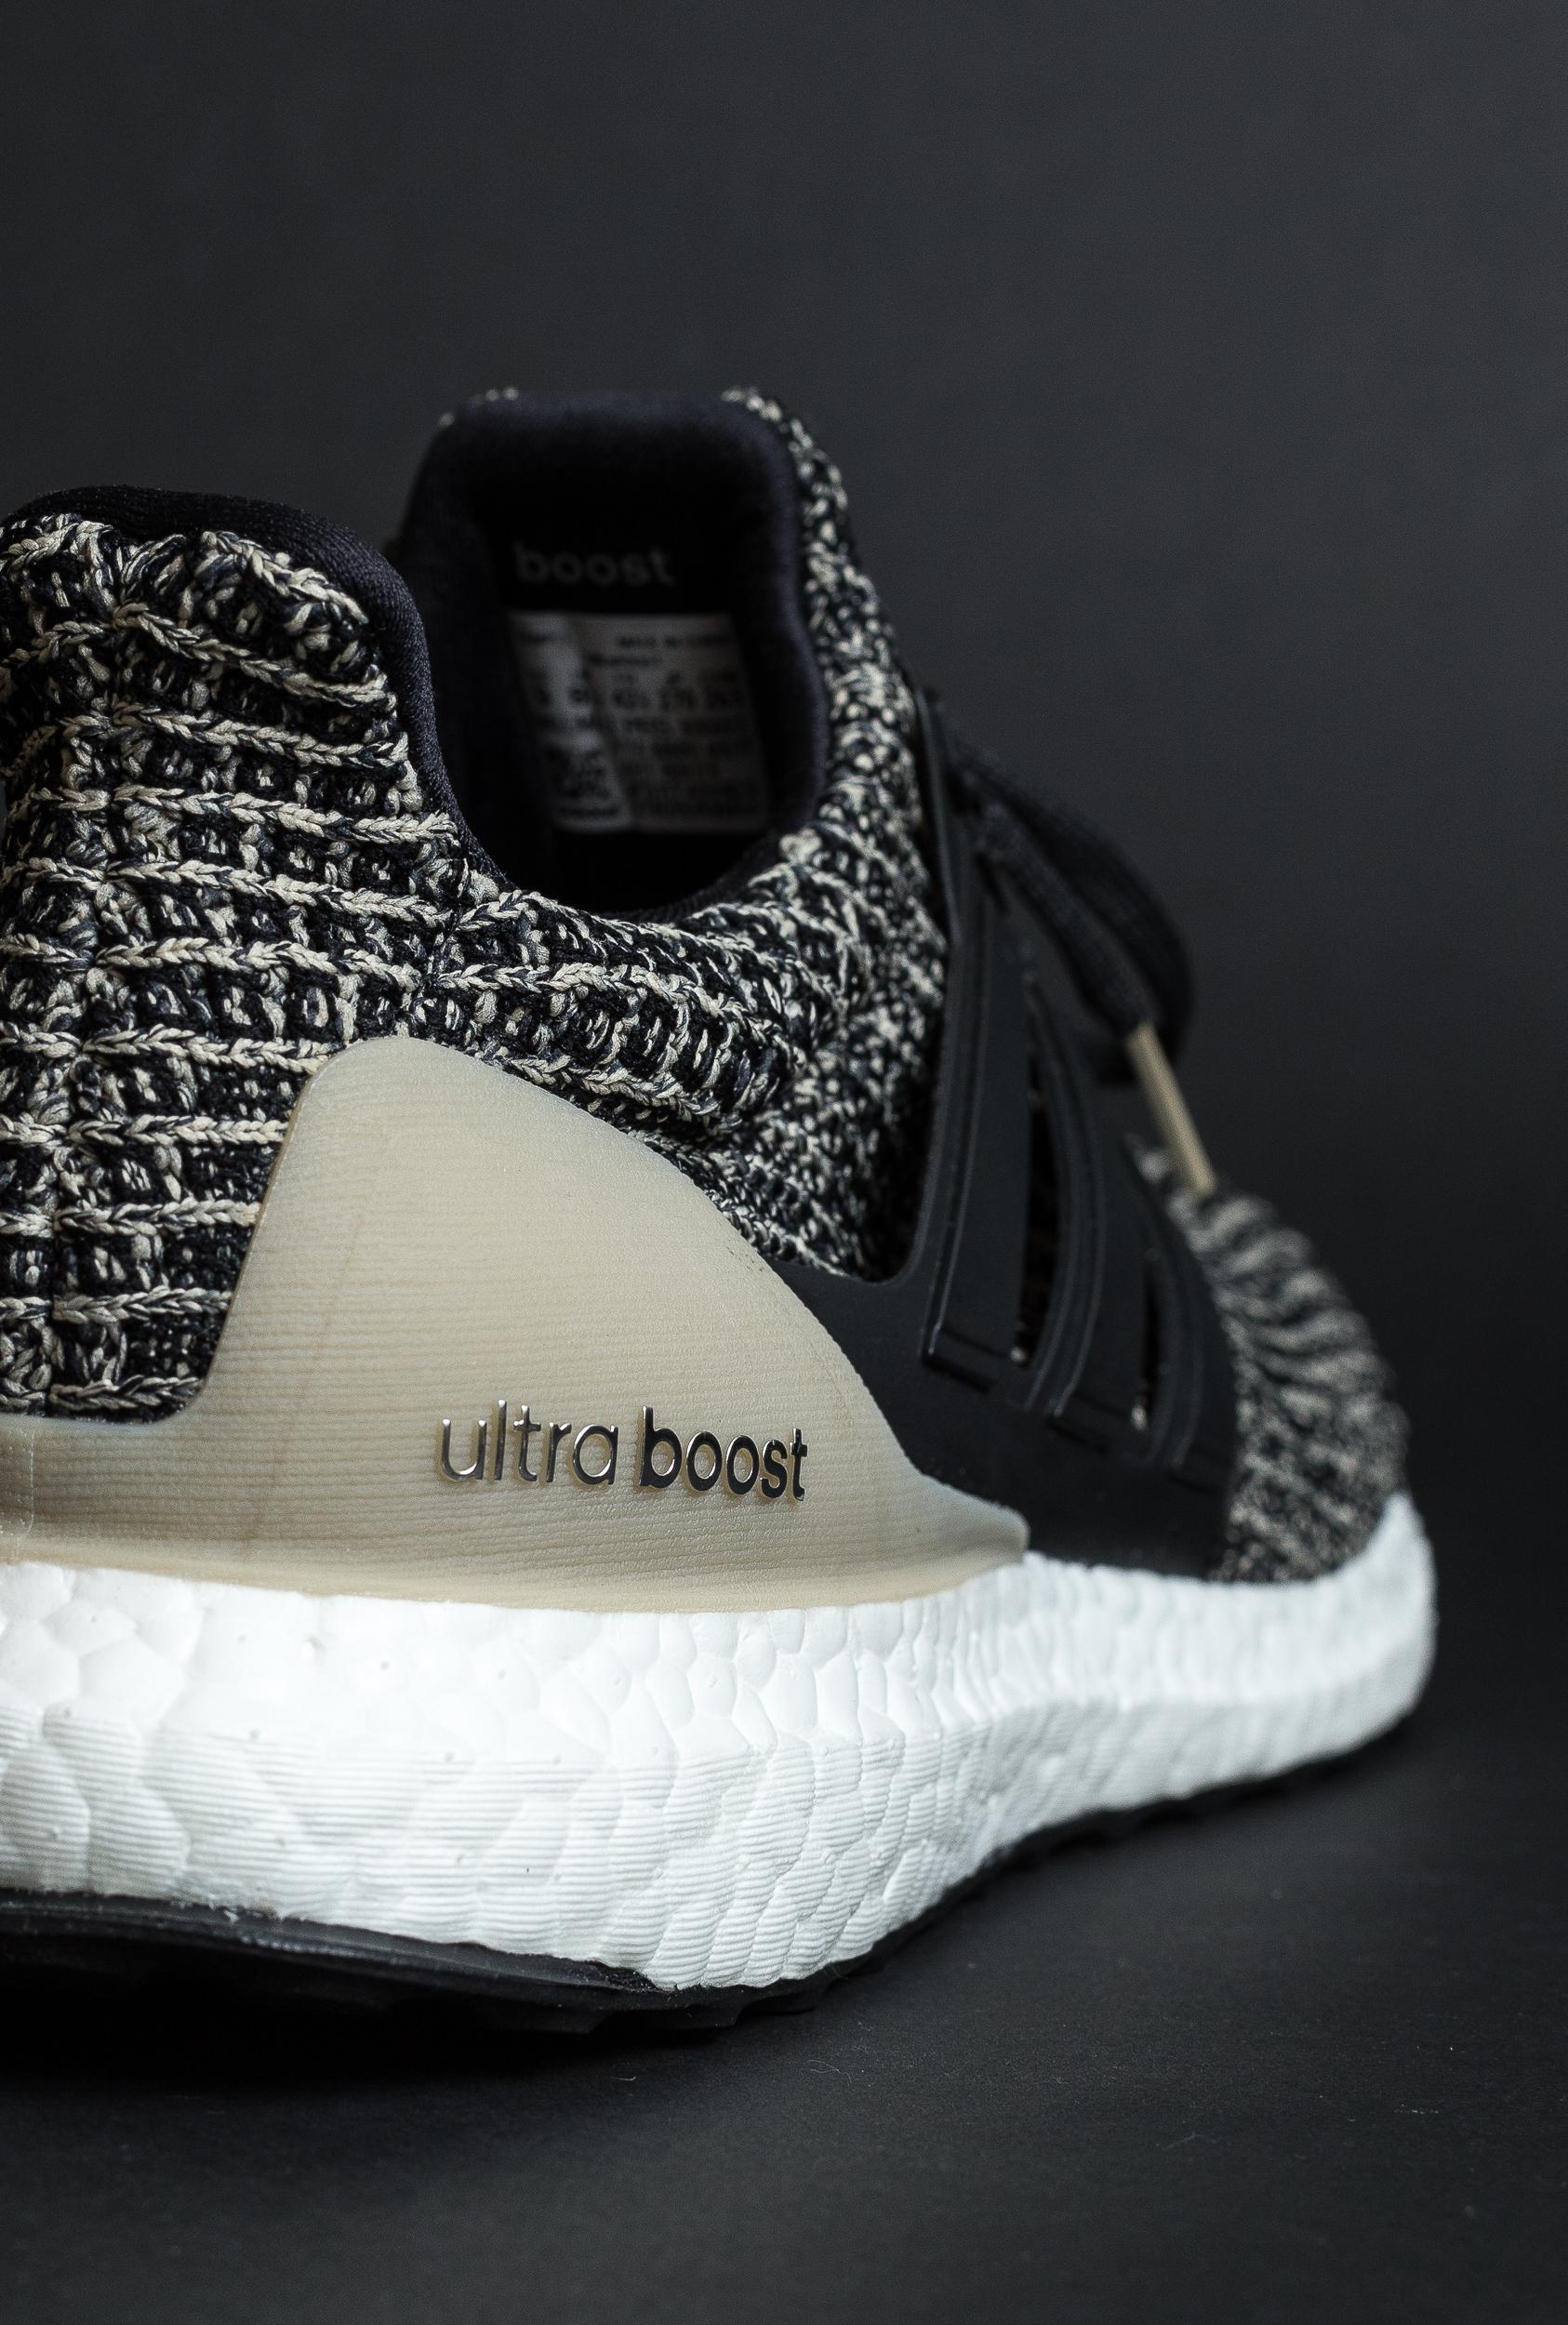 adidas Ultra BOOST 4.0 'MOCHA' — STRIPE CENTER